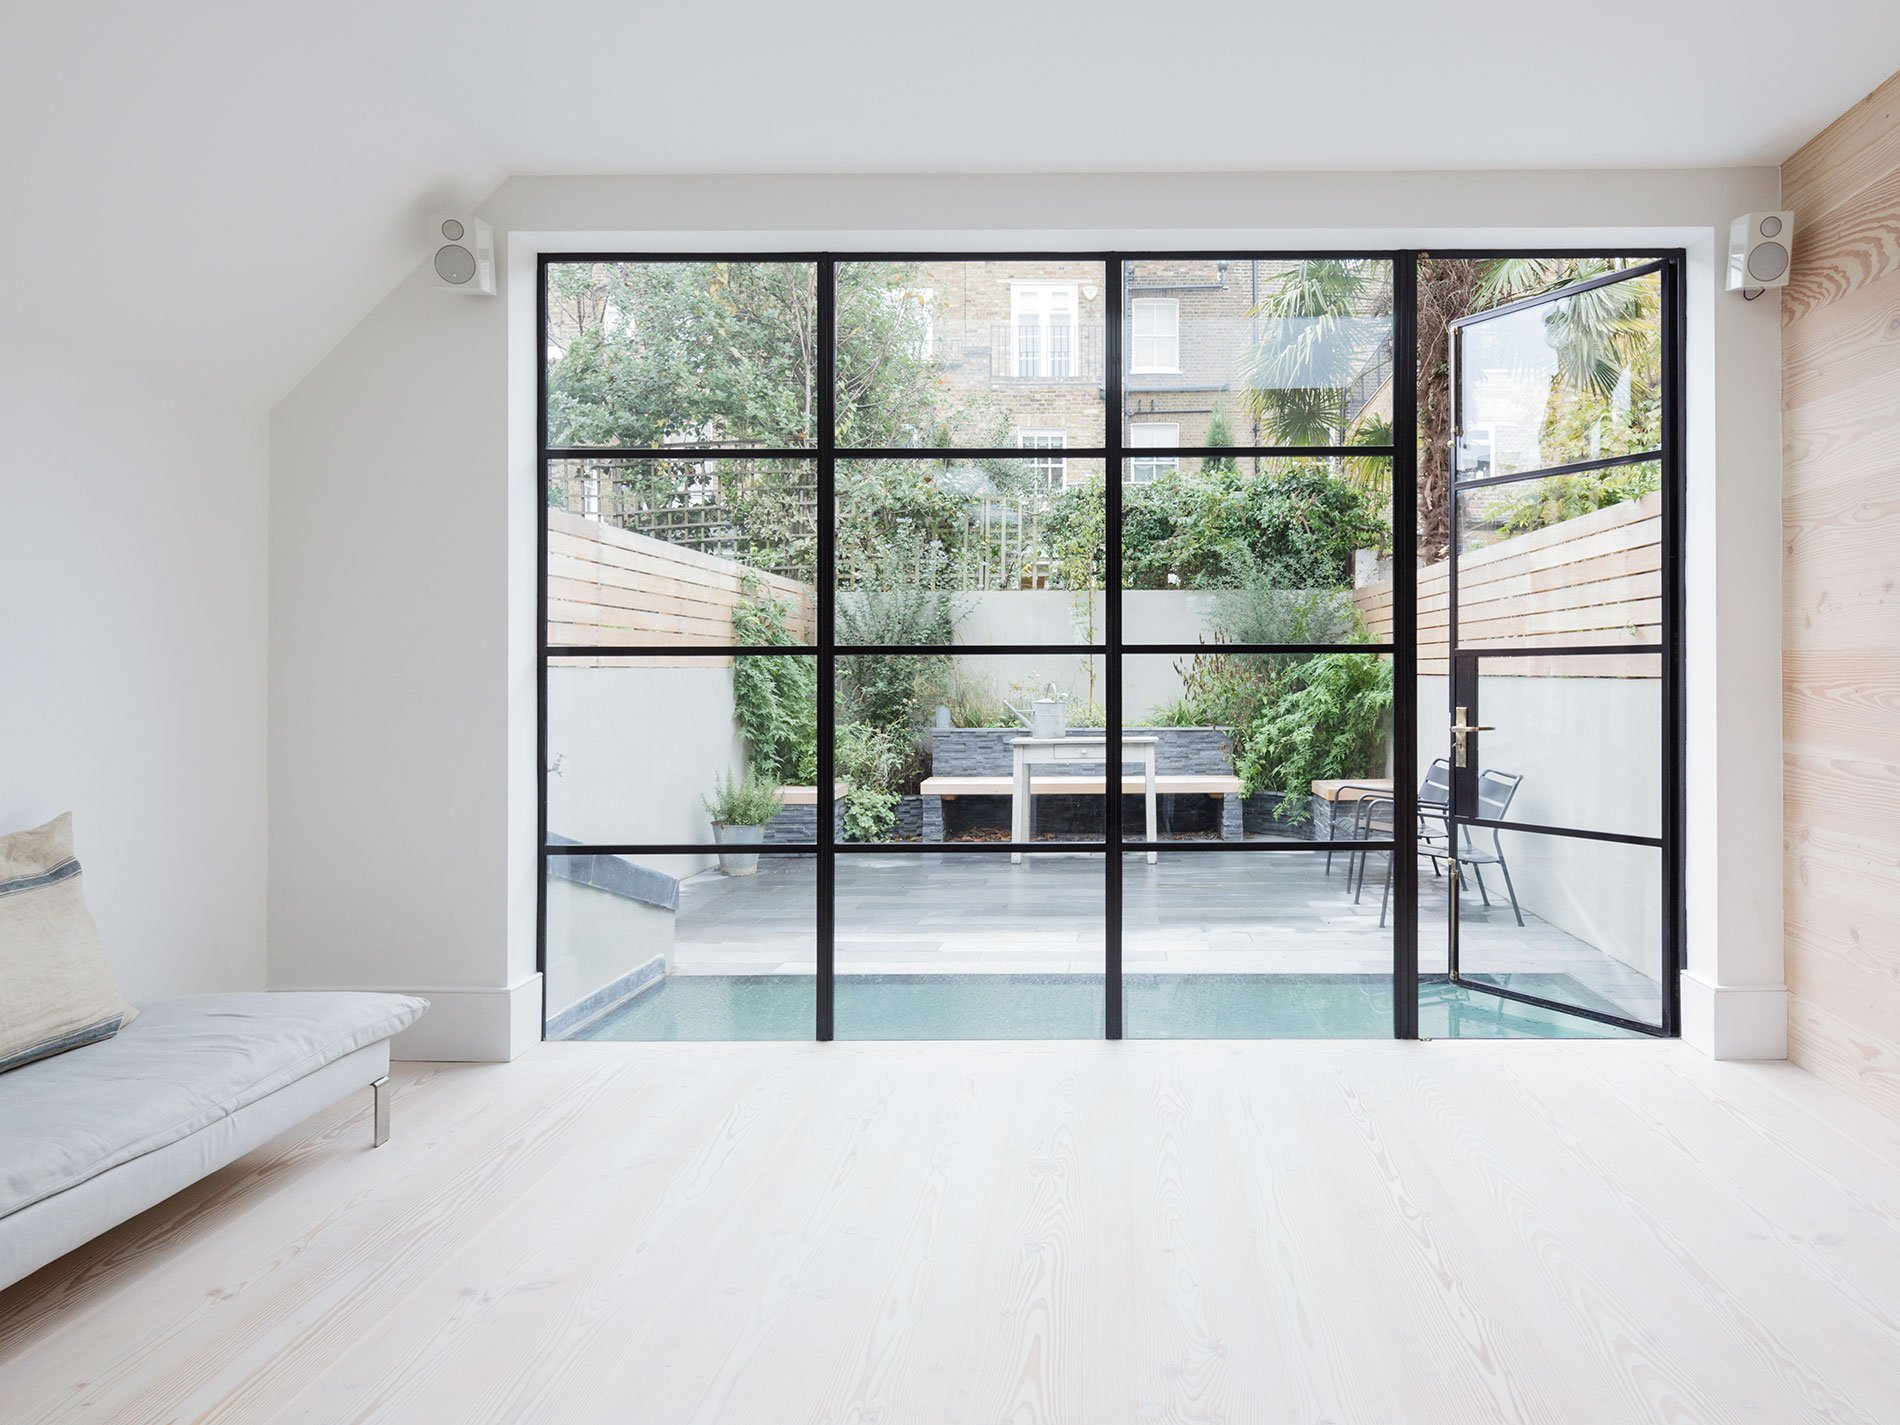 Minimalist Family Home Renovation in London